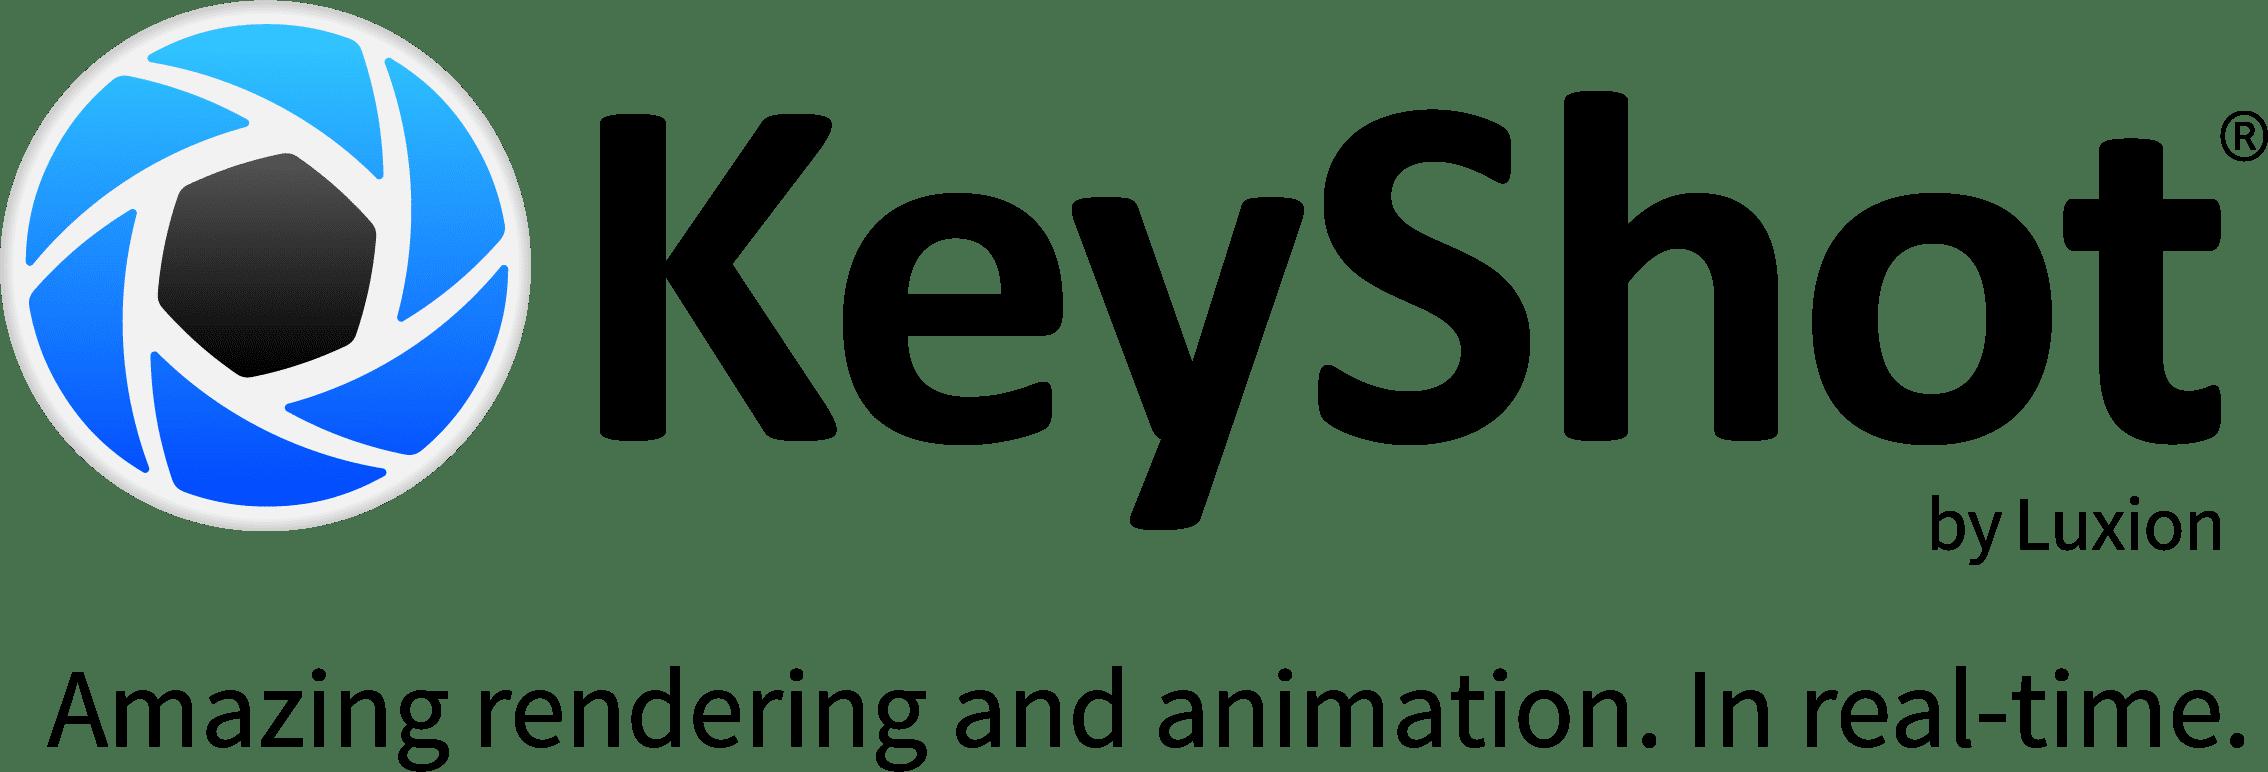 keyshot_by_luxion-tagline-black-rgb